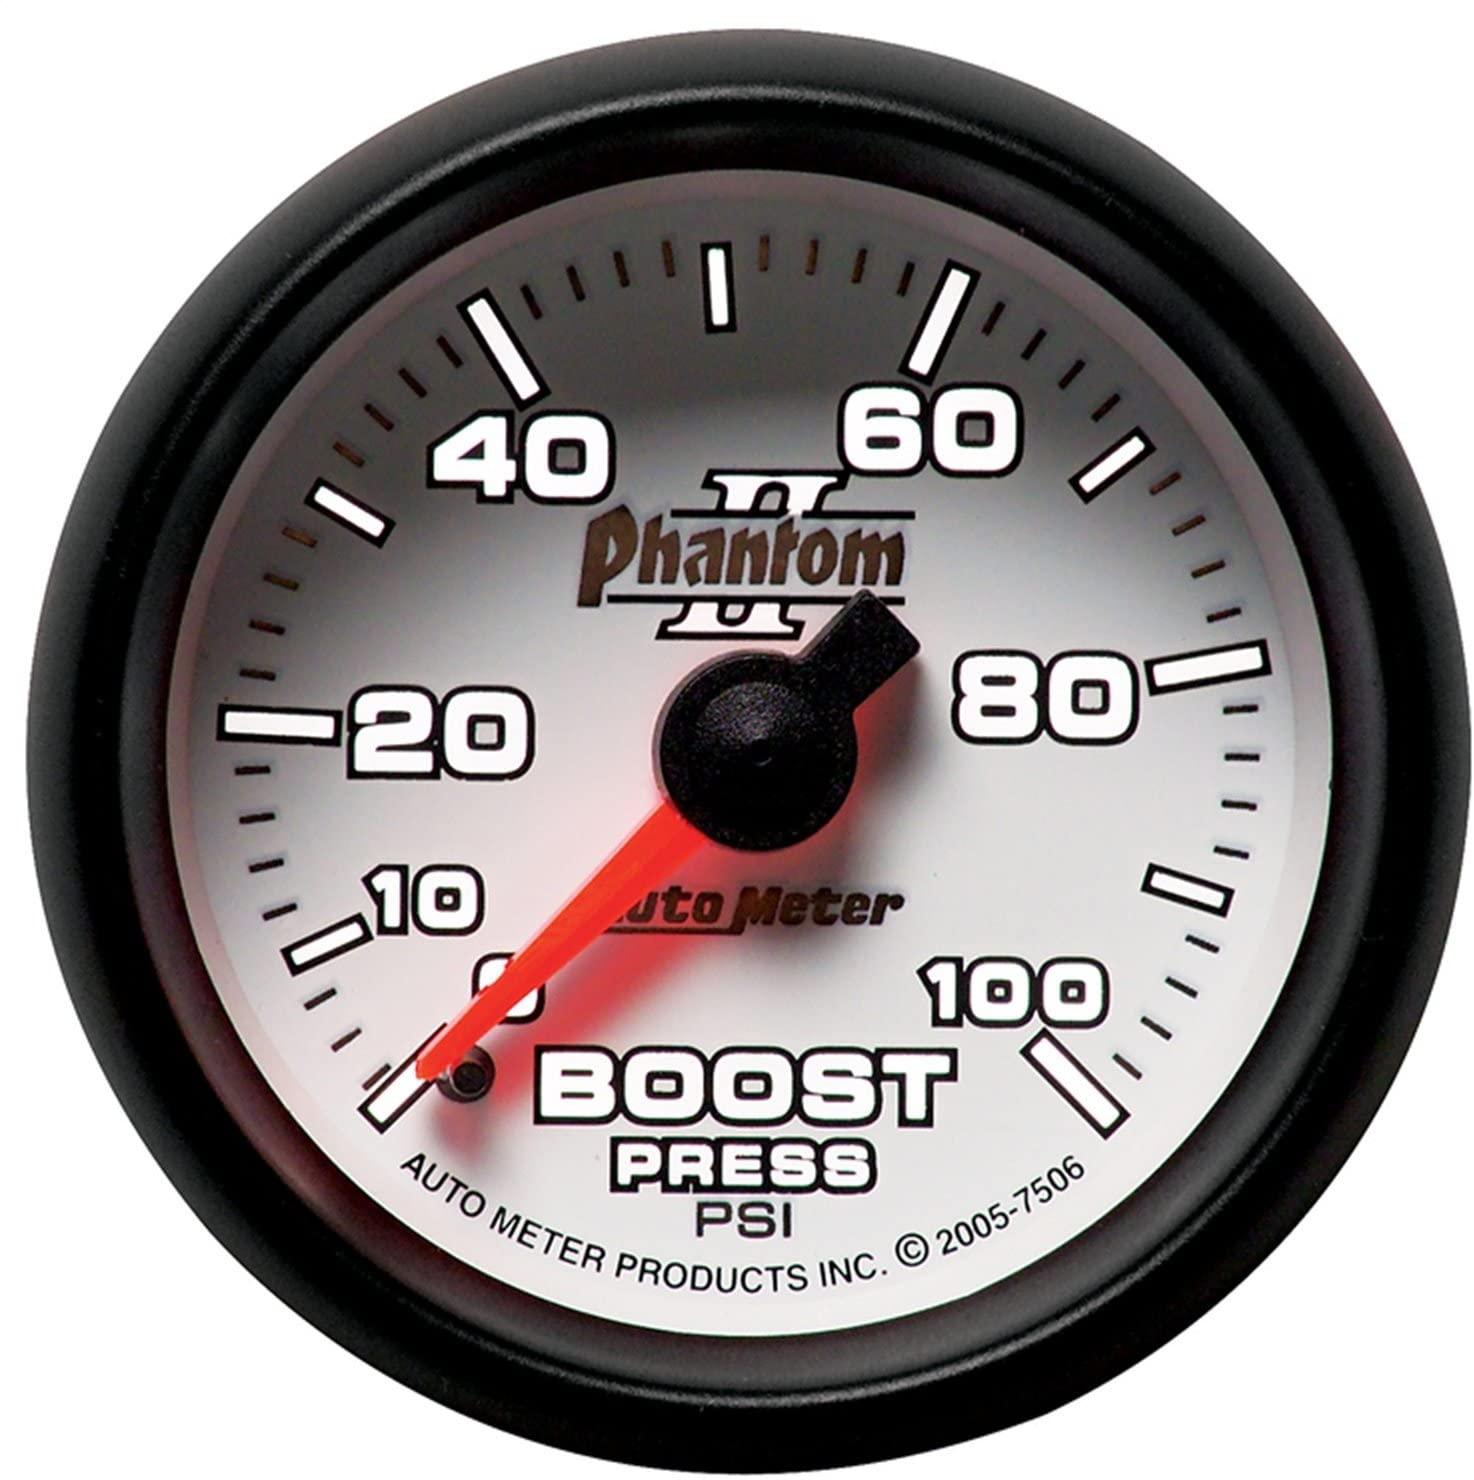 Auto Meter 7506 Phantom II 2-1/16